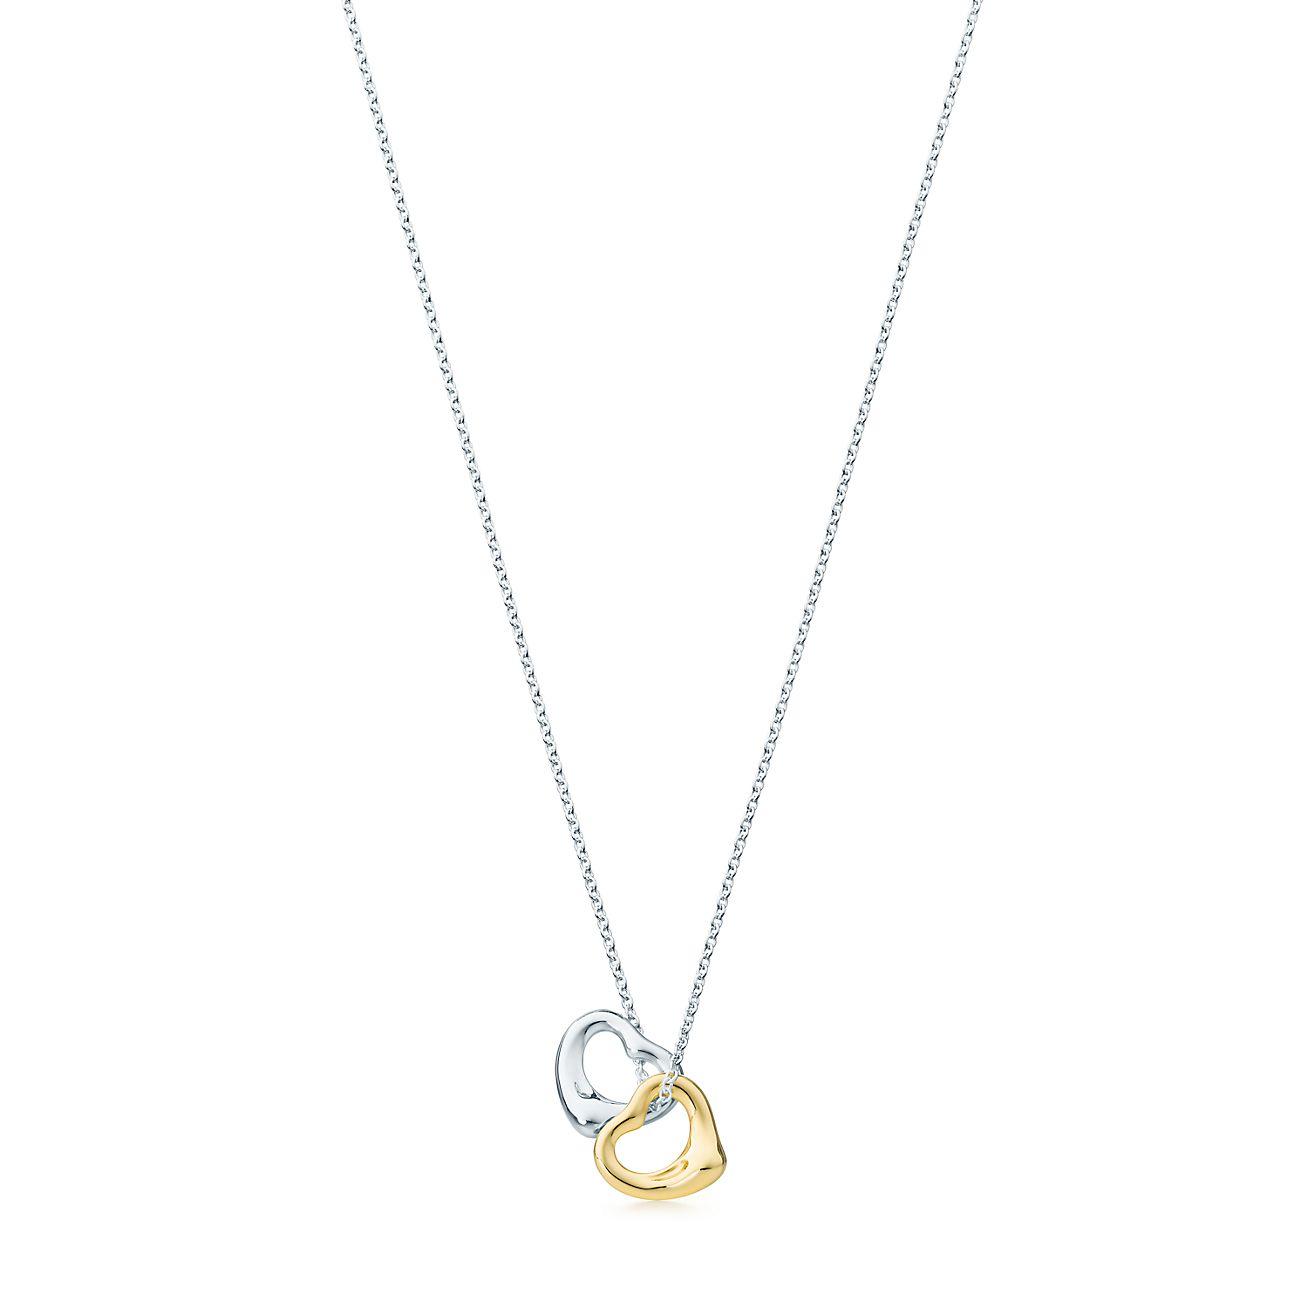 Jewelry amp watches gt fine jewelry gt fine necklaces amp pendants gt diamond - Tiffany Elsa Peretti Open Heart Pendant 18k Hot Girls